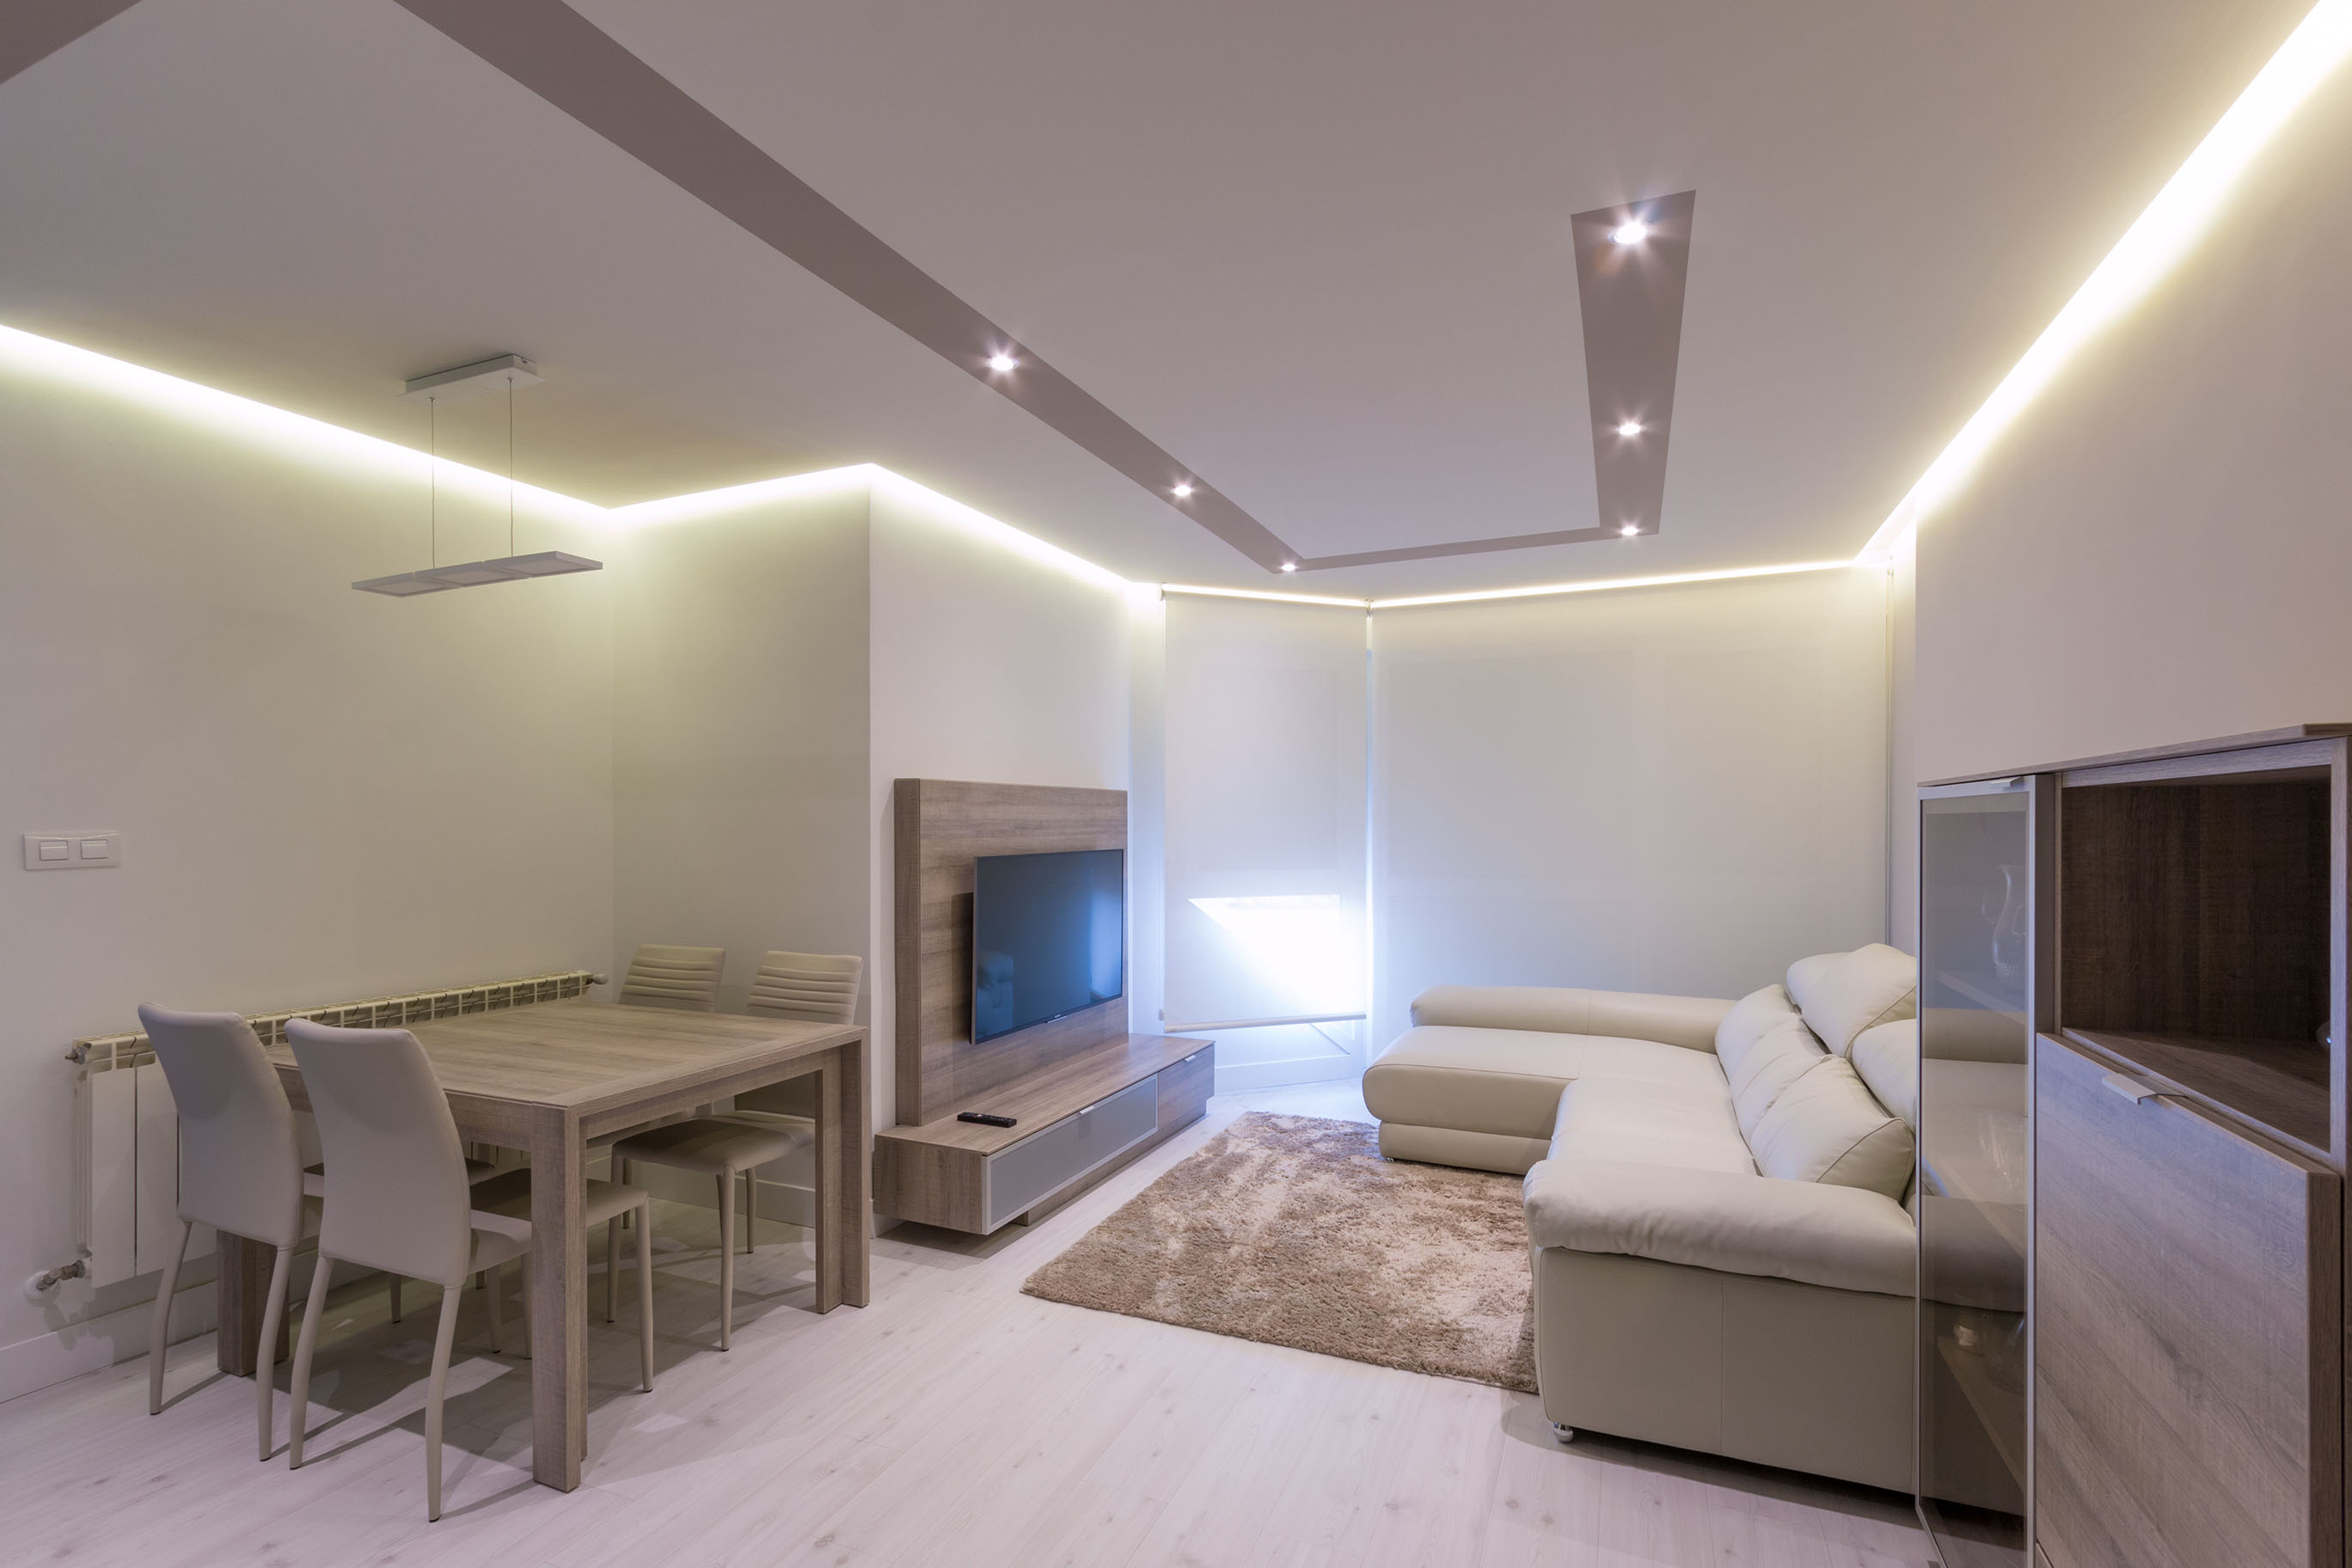 Vivienda en portugalete interdecor bilbao - Iluminacion indirecta led ...